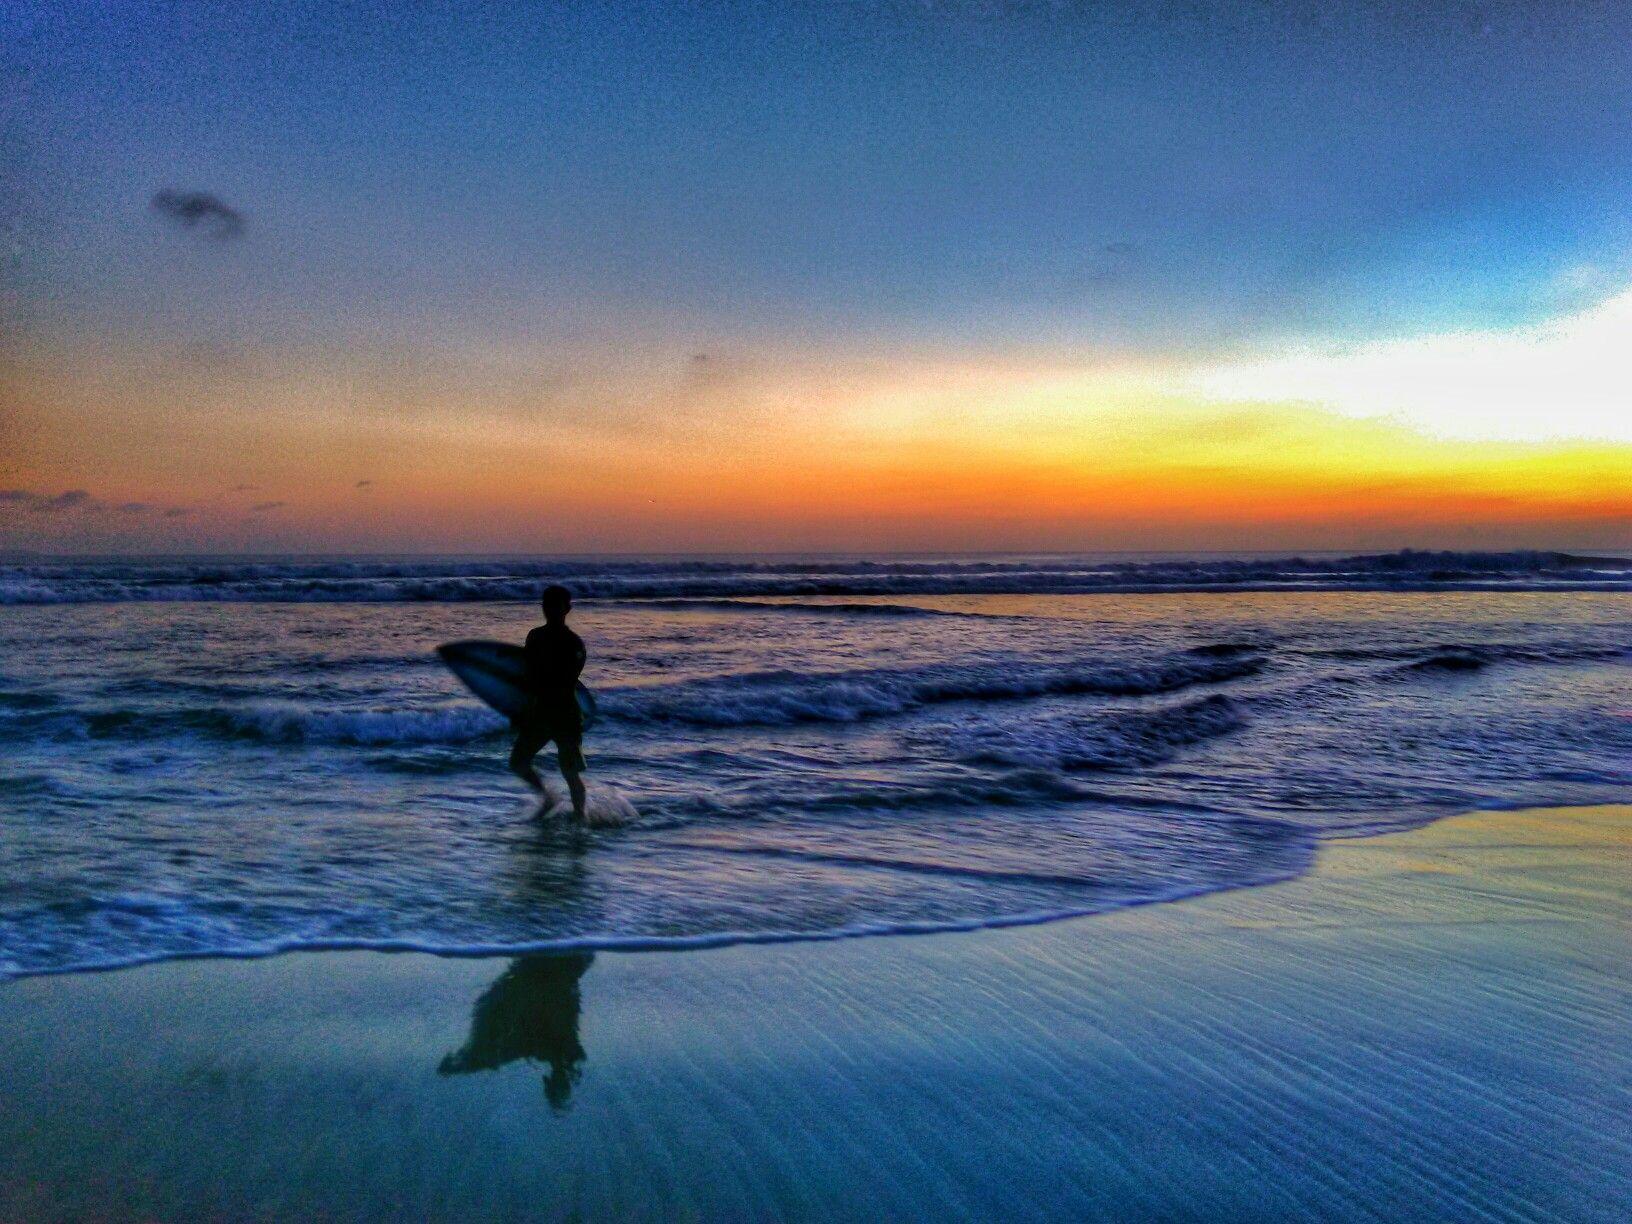 Sunset Contact Us Zabronirovat Uroki Www Windysunbalisurfschool Com Windysun Surfersbali Com 62 8786 167 68 Surfing Bali Surf Surf School